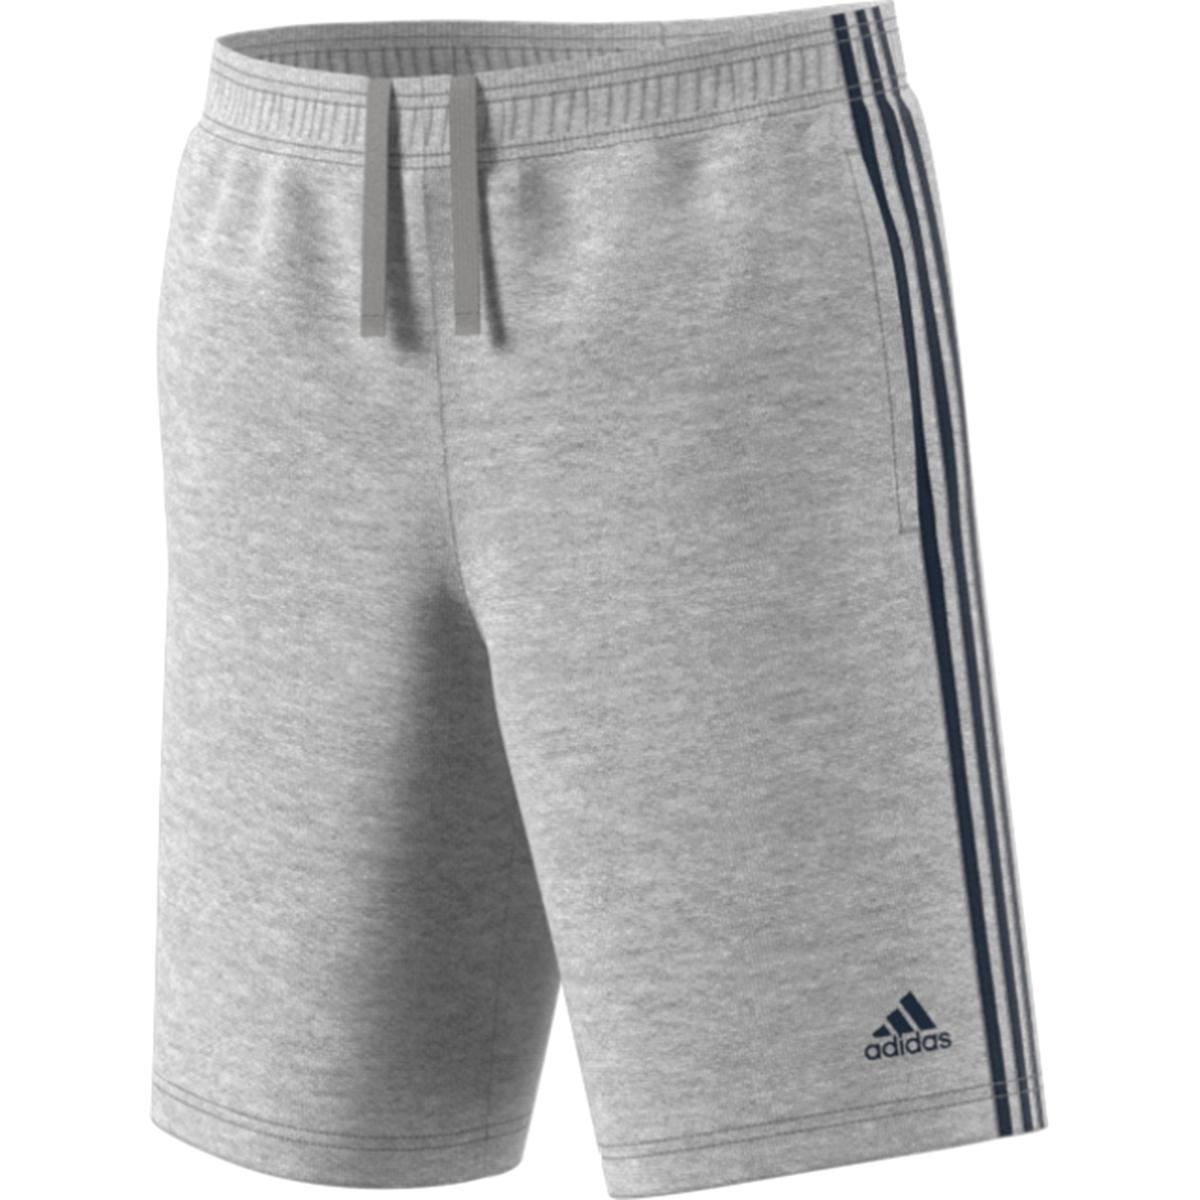 Shorts in felpa